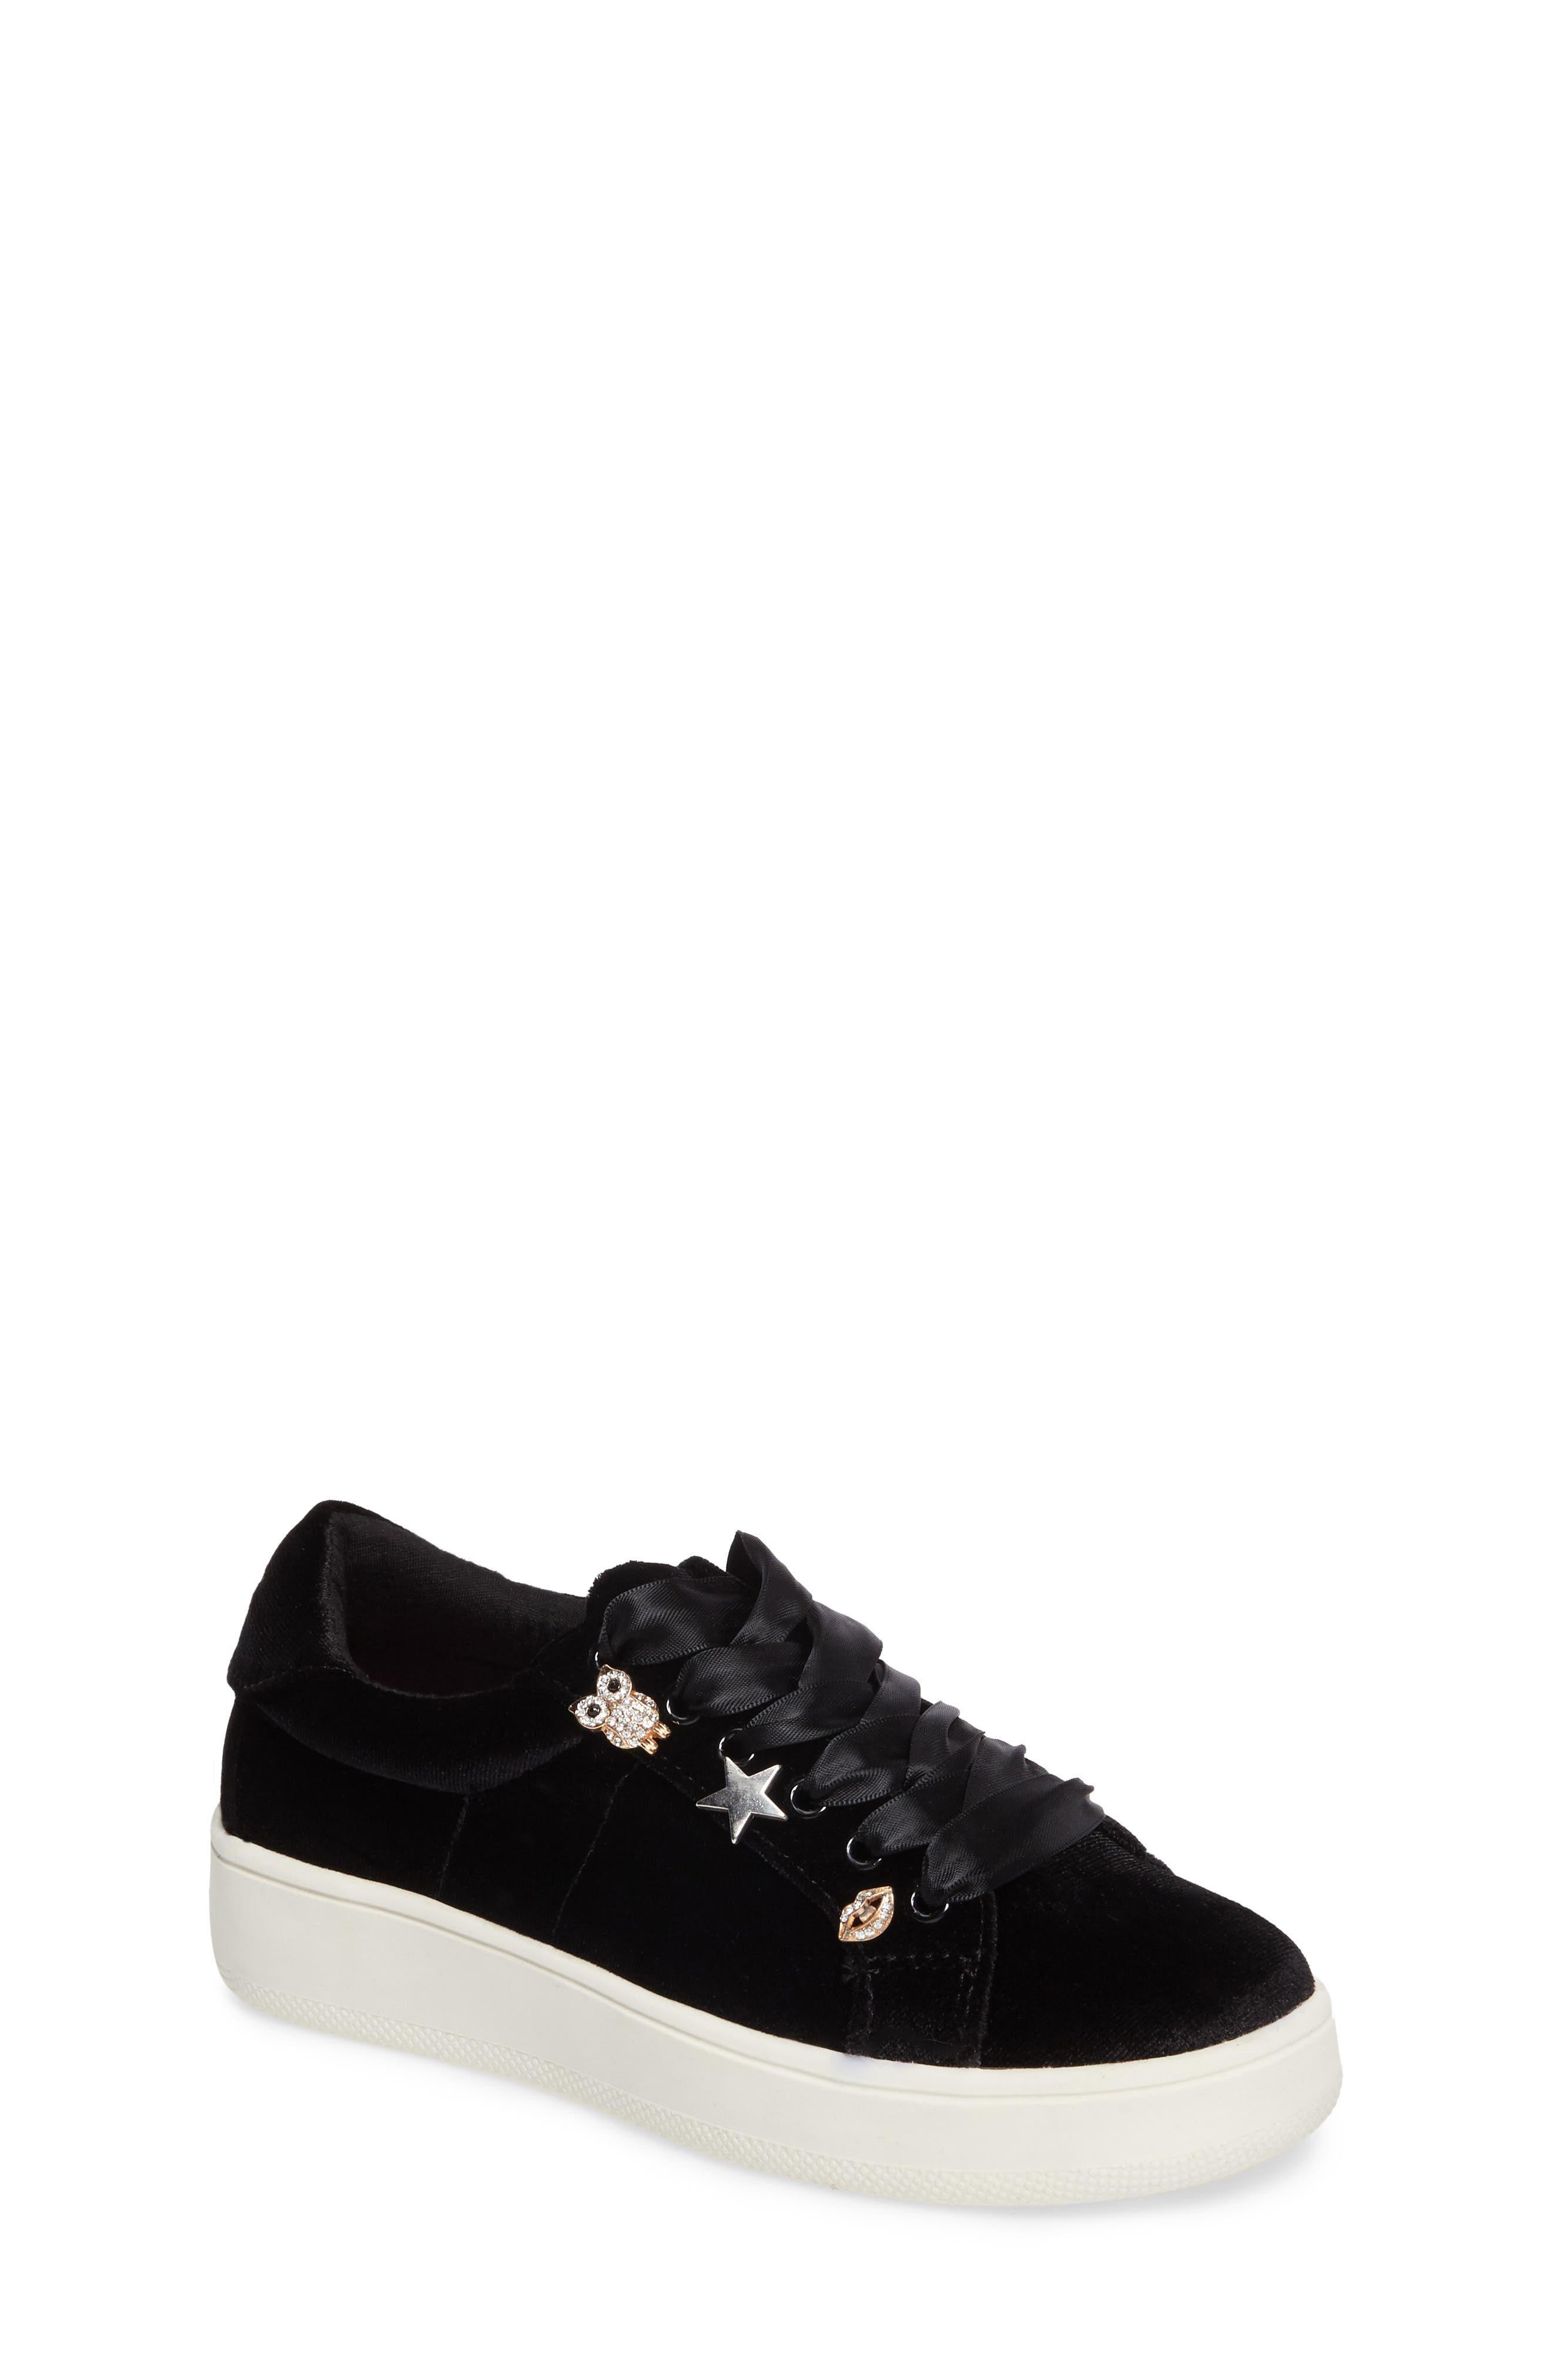 Jbertiec Charm Sneaker,                             Main thumbnail 1, color,                             009